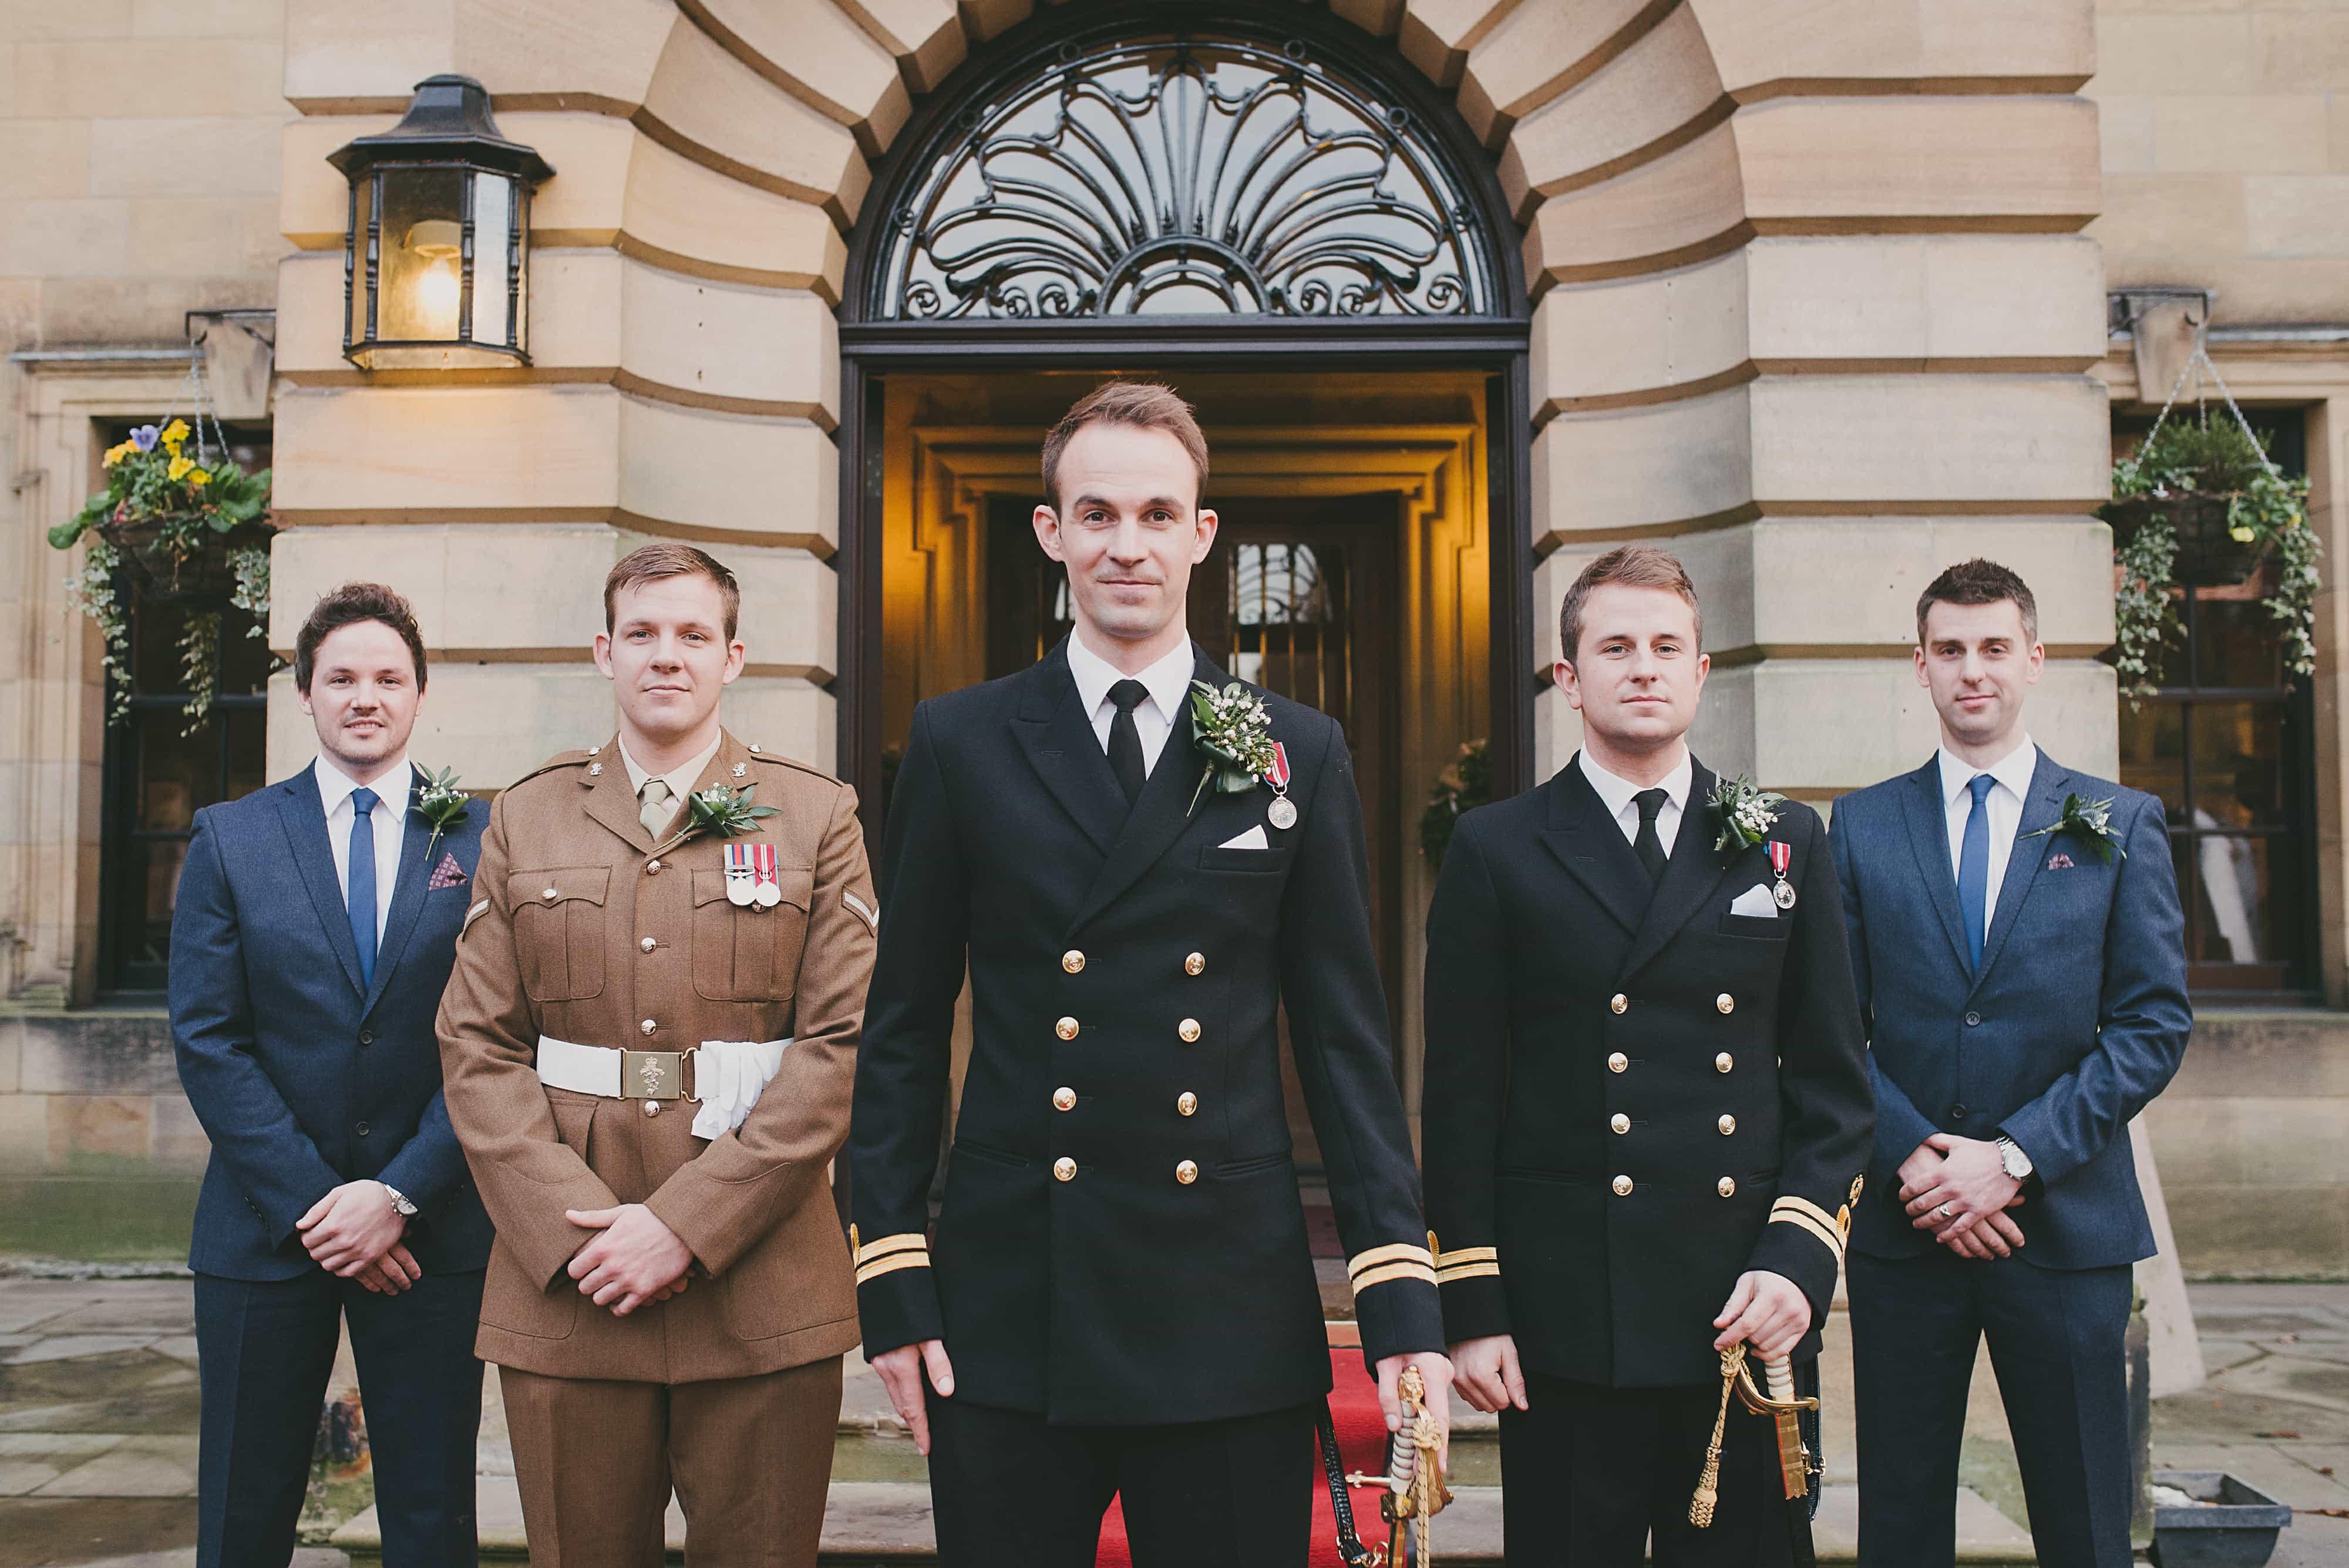 staffordshire-wedding-photographer-37